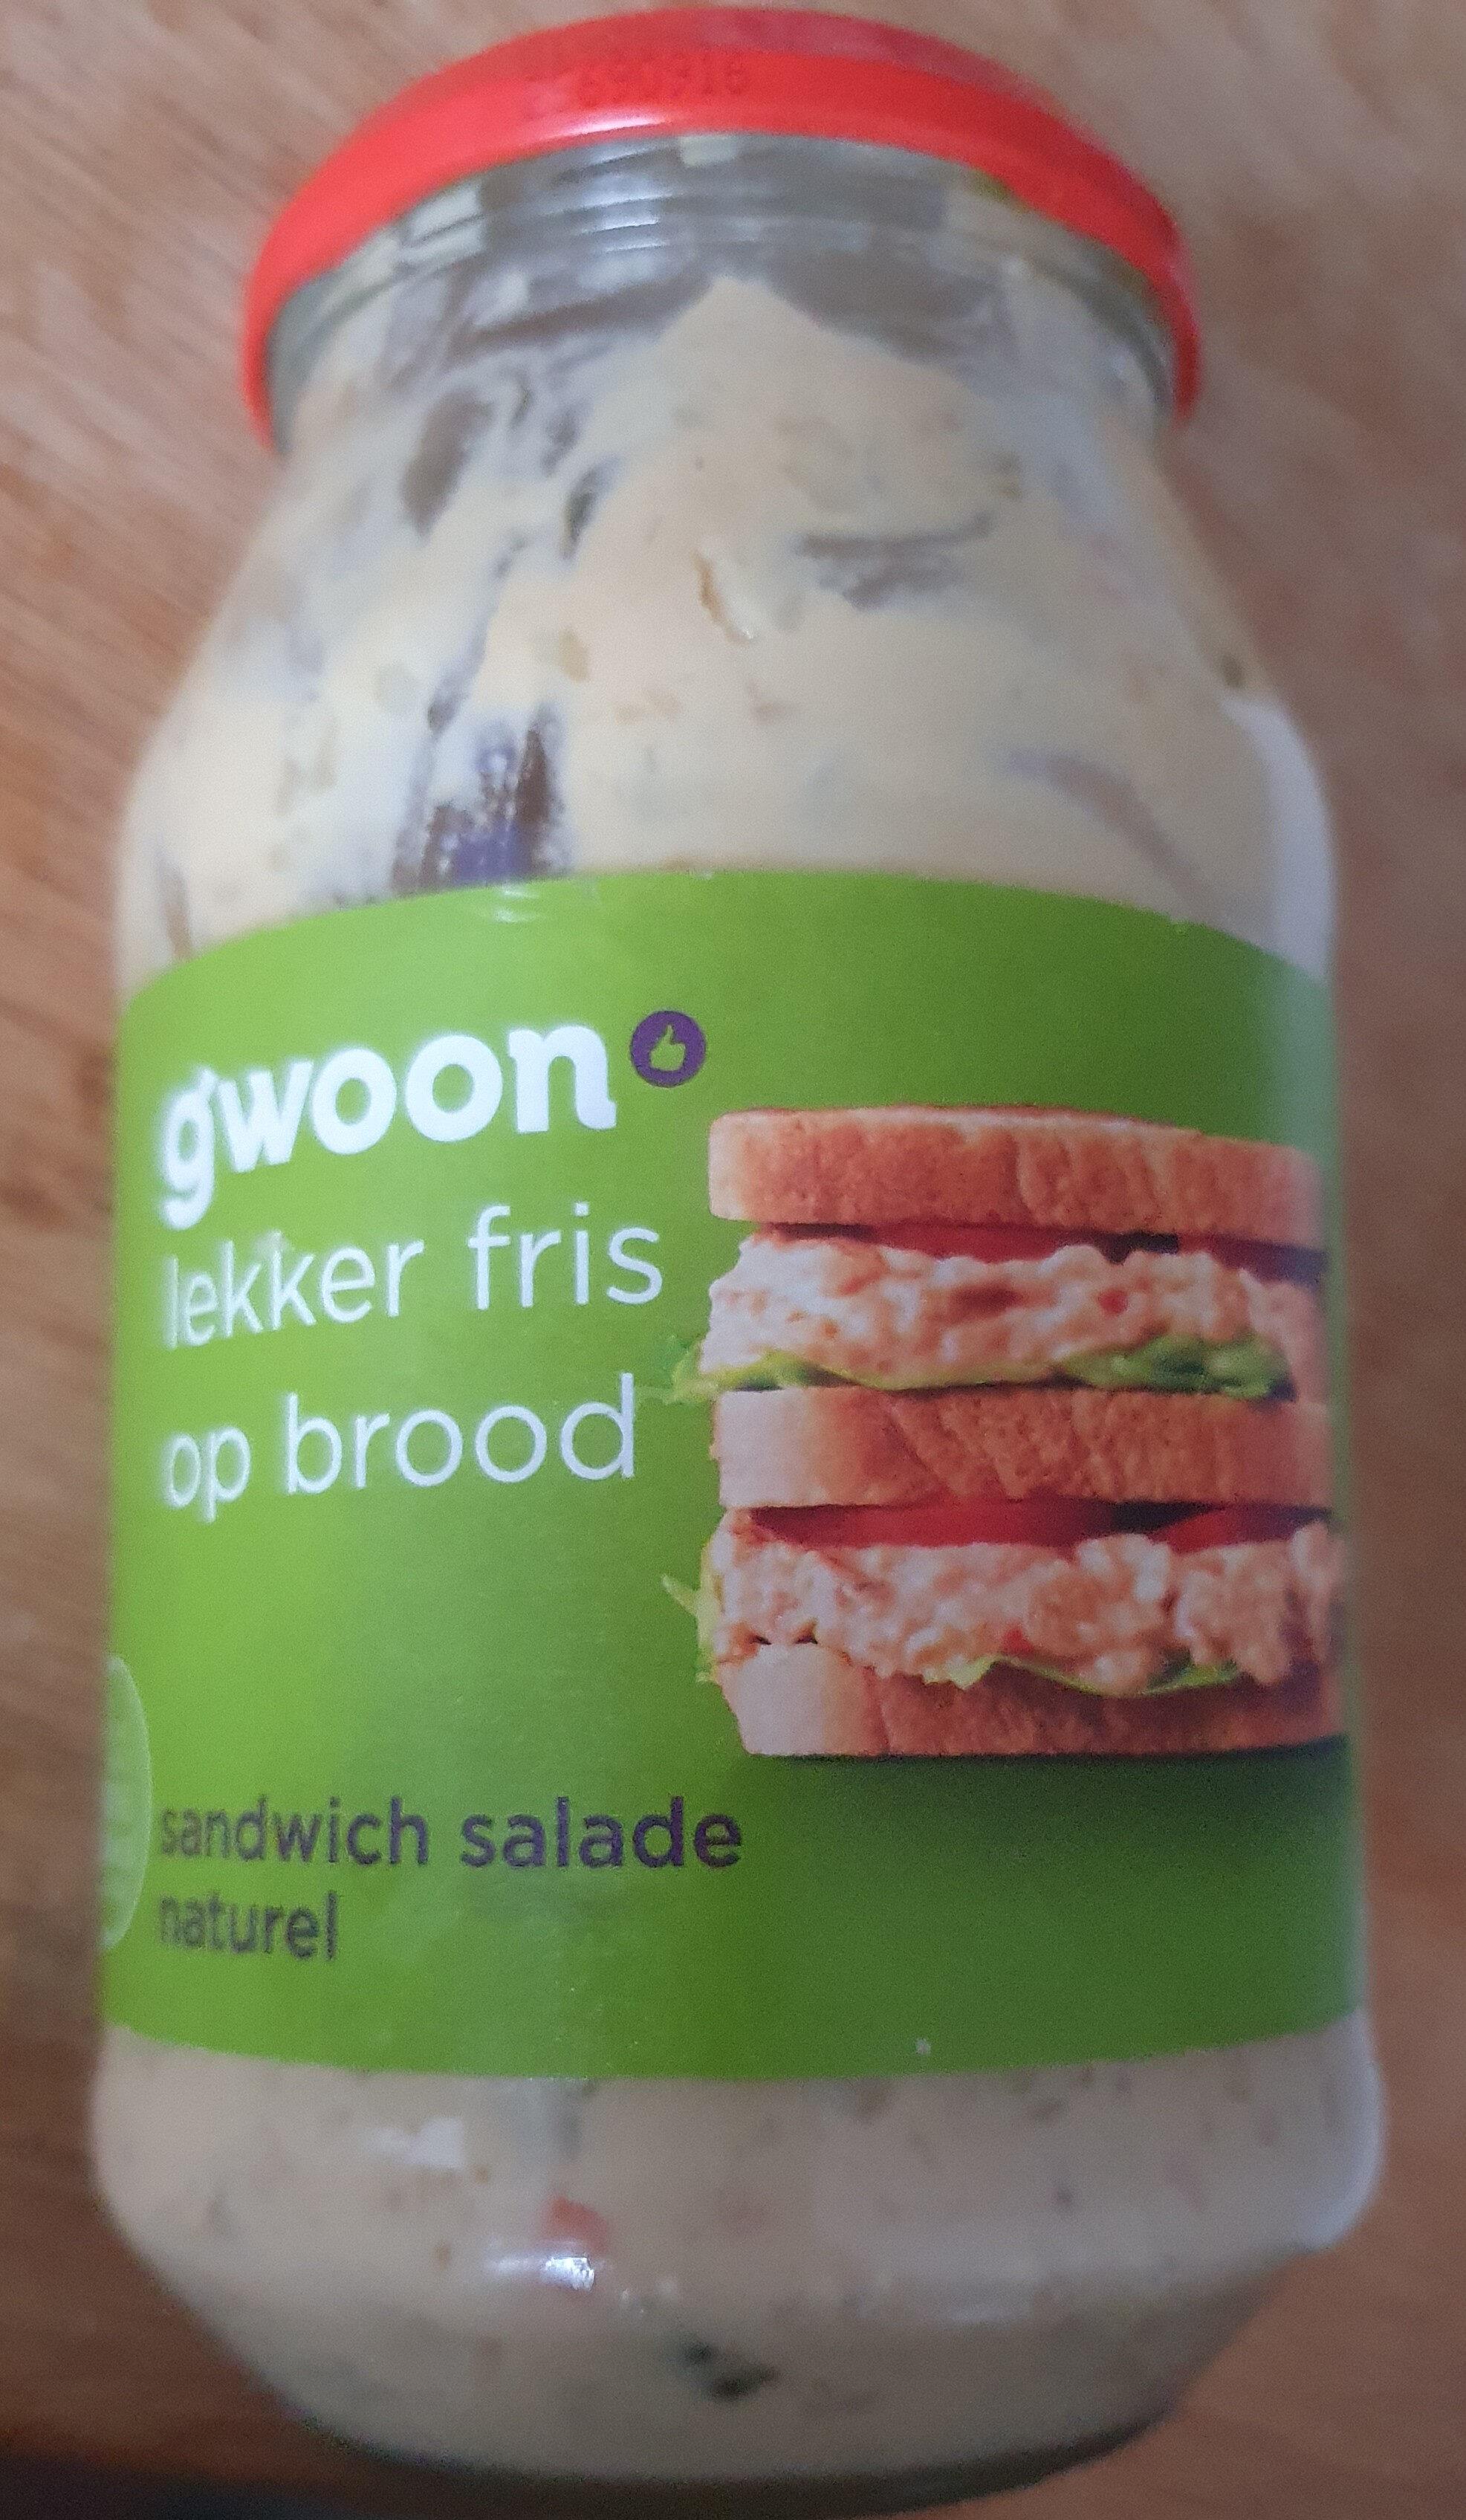 Sandwich salade naturel - Product - nl